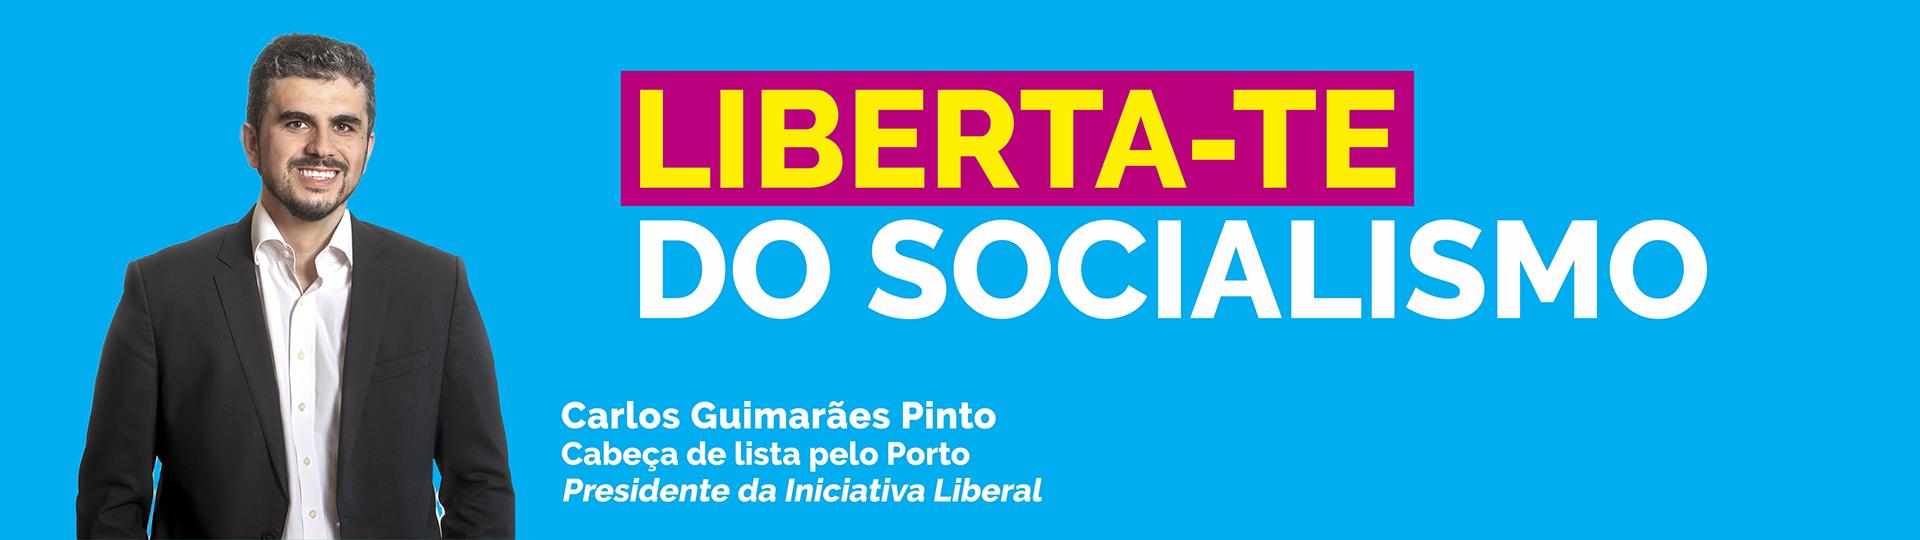 LEG19 - Banner wide socialismo